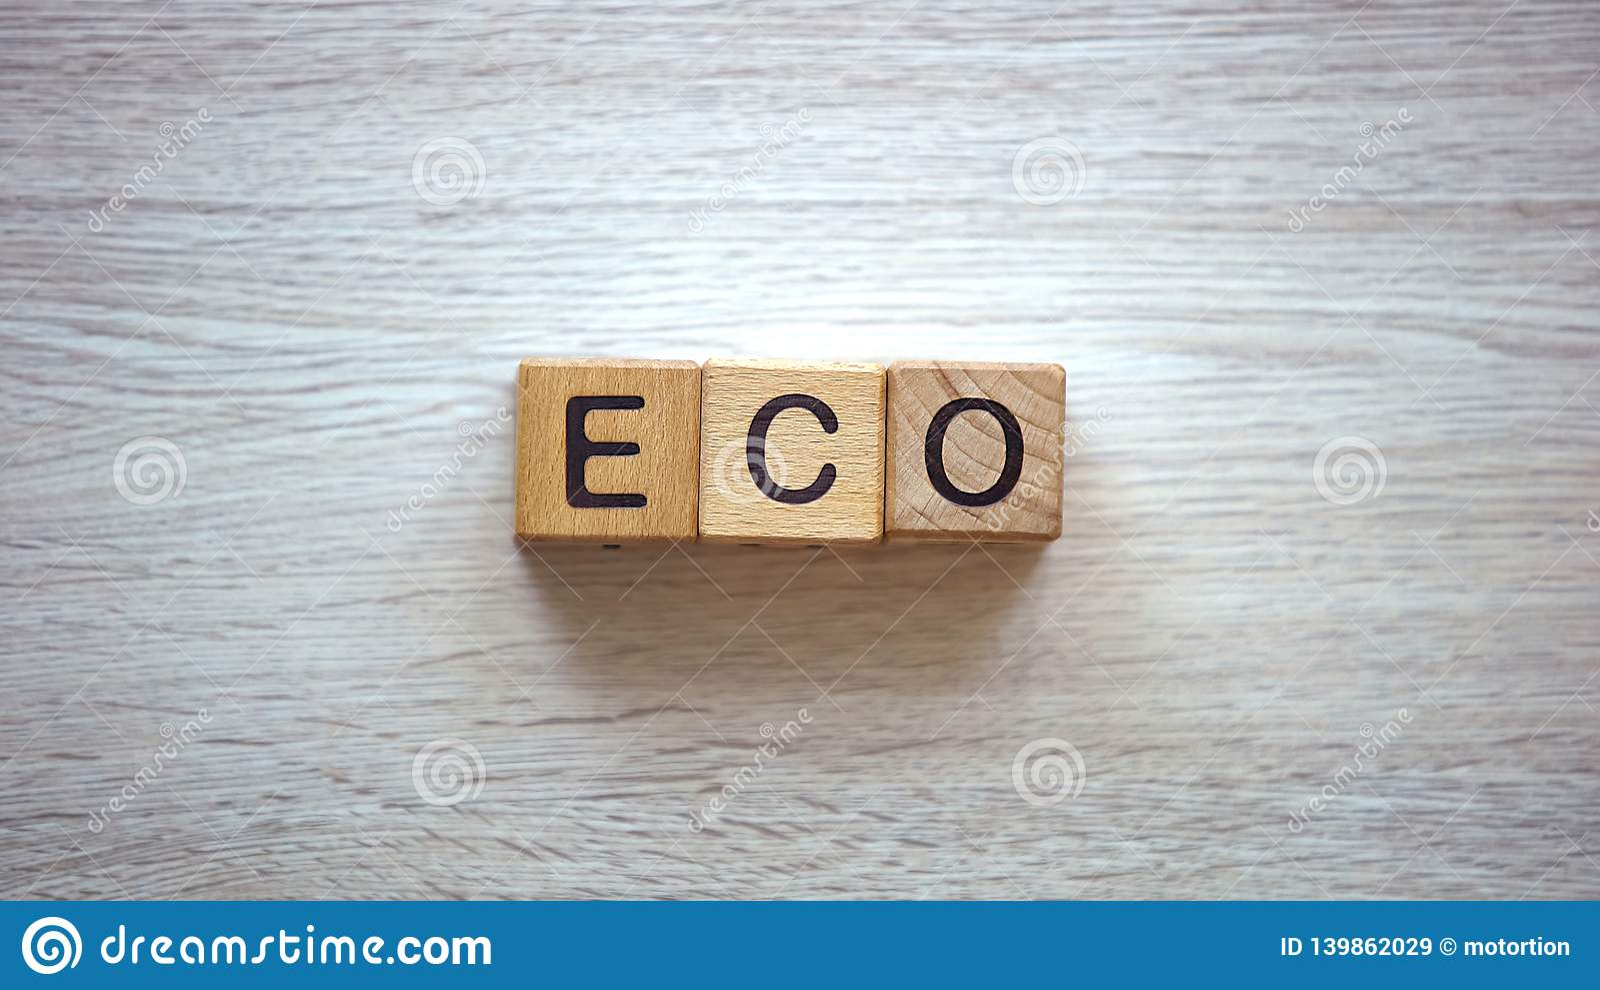 Eco词由木立方体制成,方式保重环境回收废物的